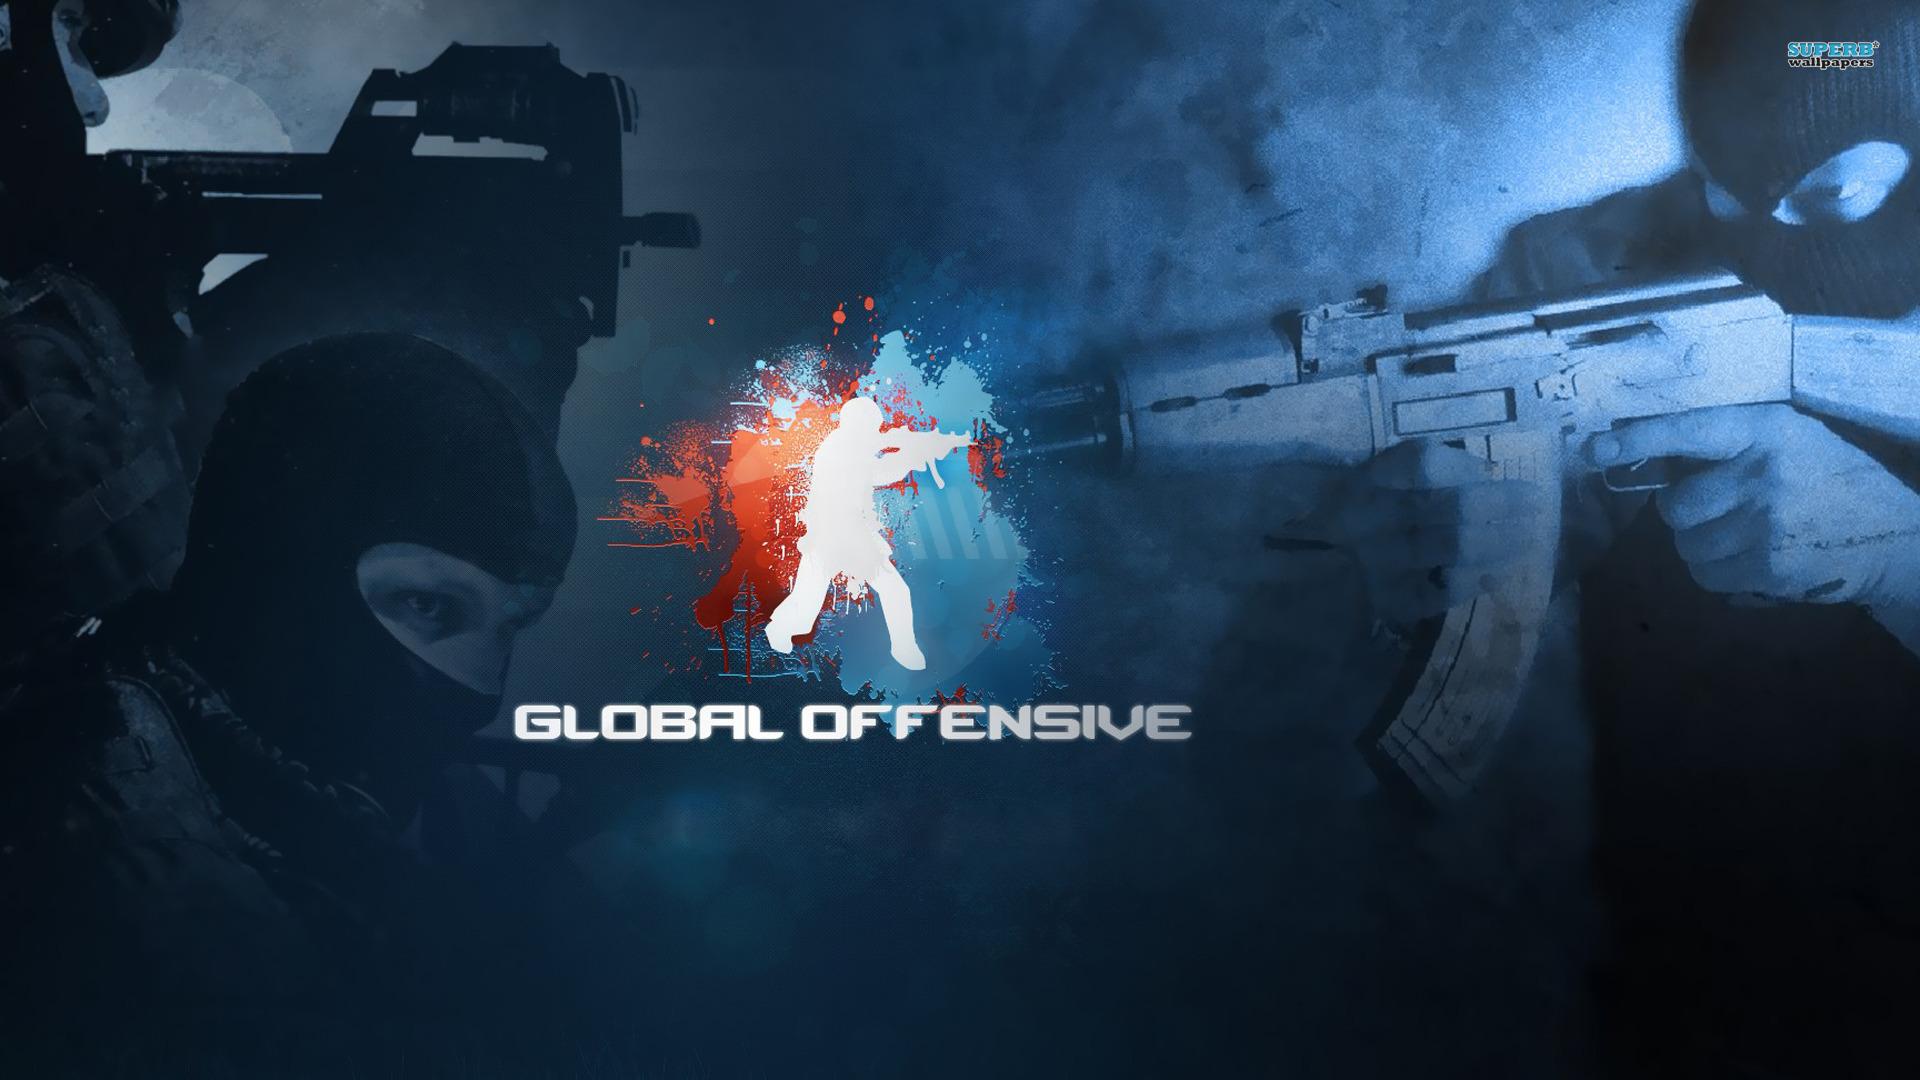 Counter Strike Global Offensive Wallpaper 1920x1080 HD Wallpaper 1920x1080